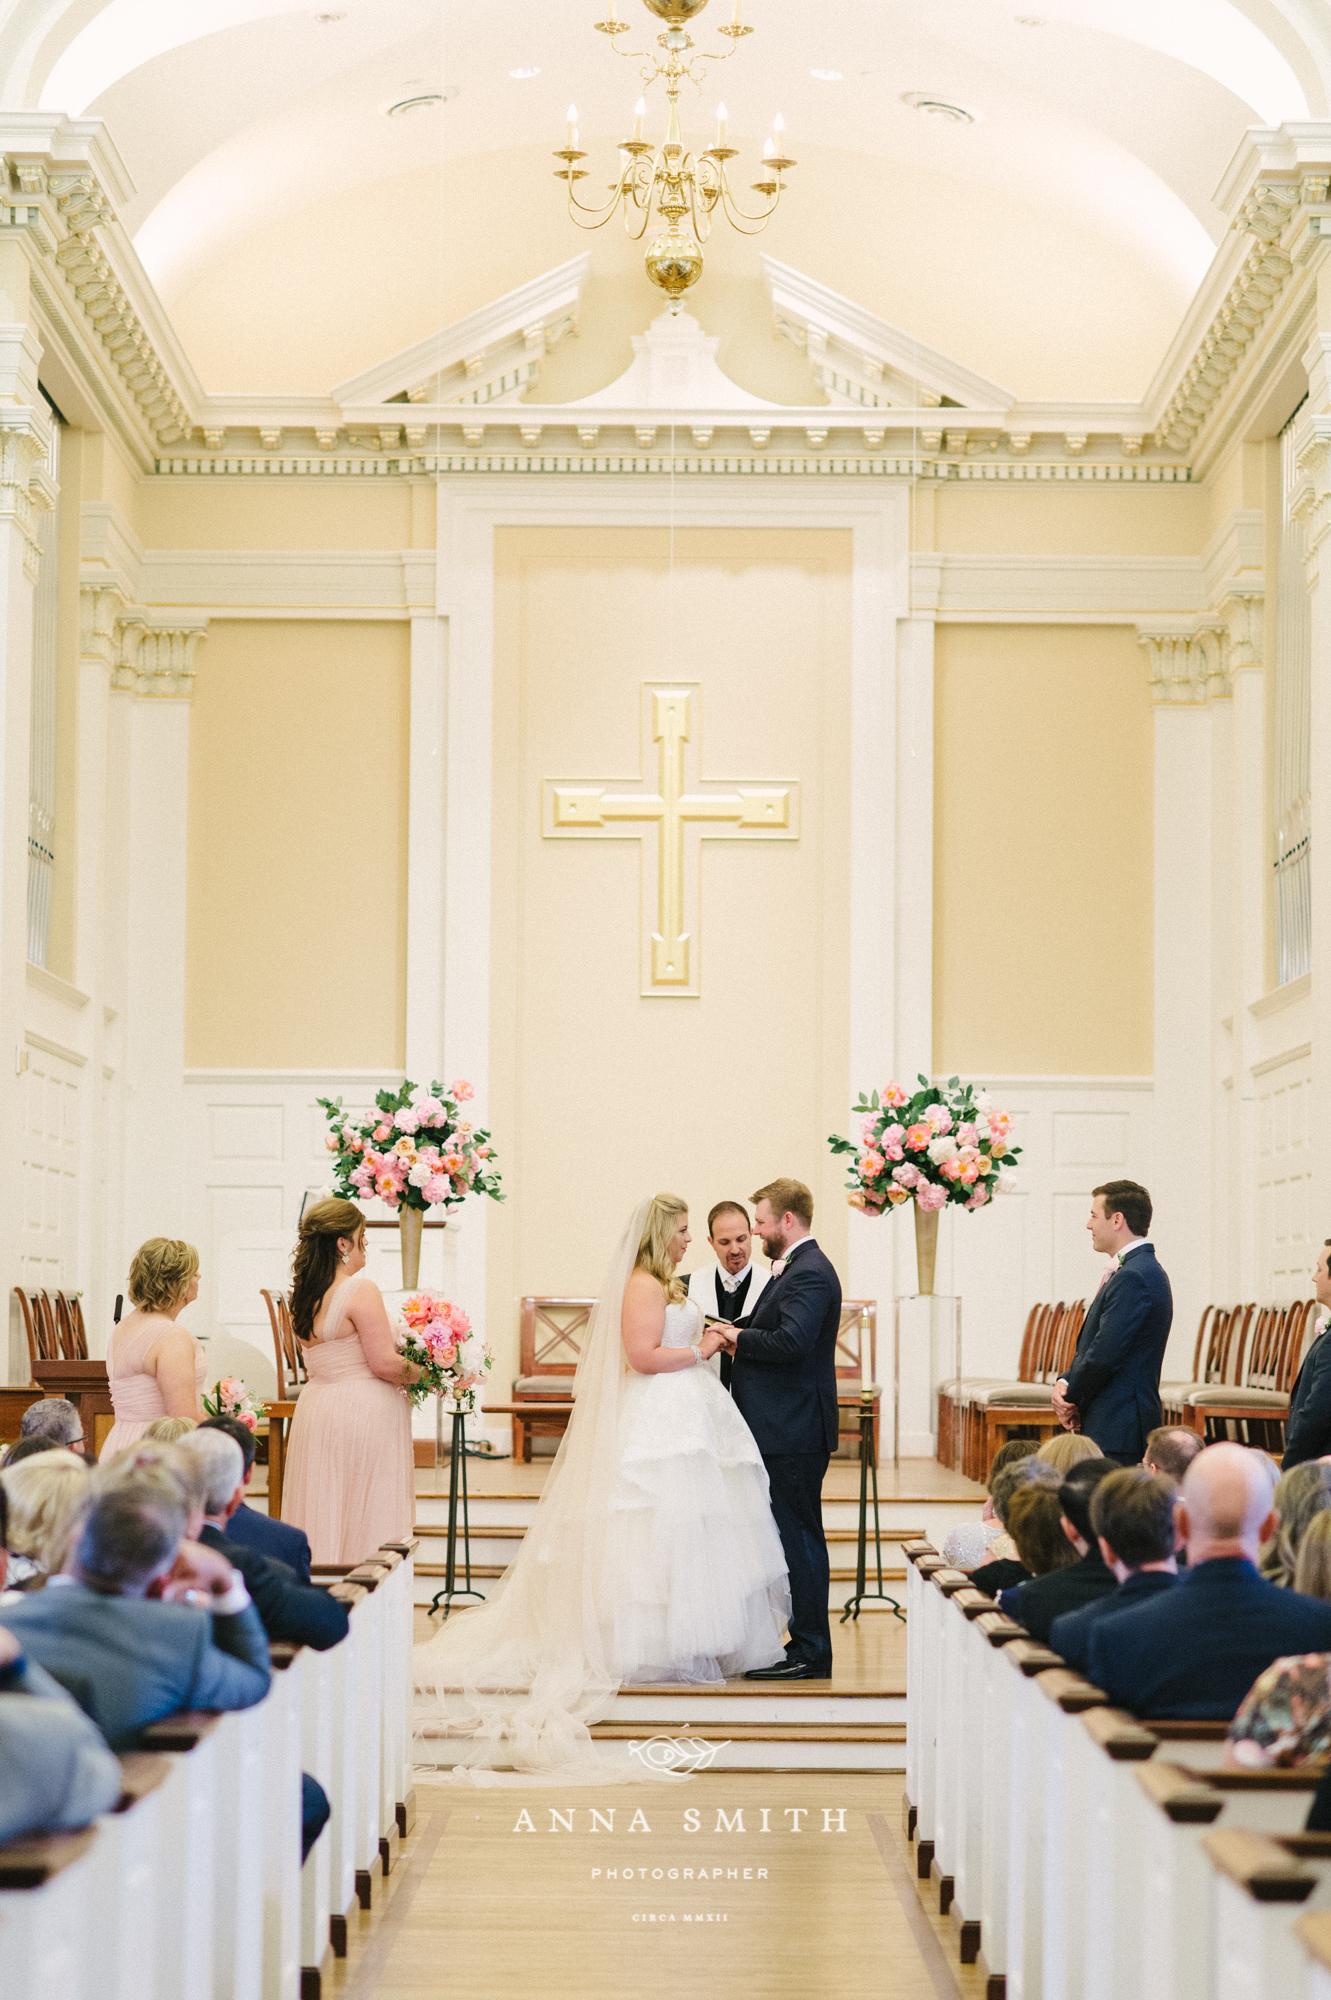 web 17- 4-W-CD-heather brandon wedding perkins adolphus-687.jpg